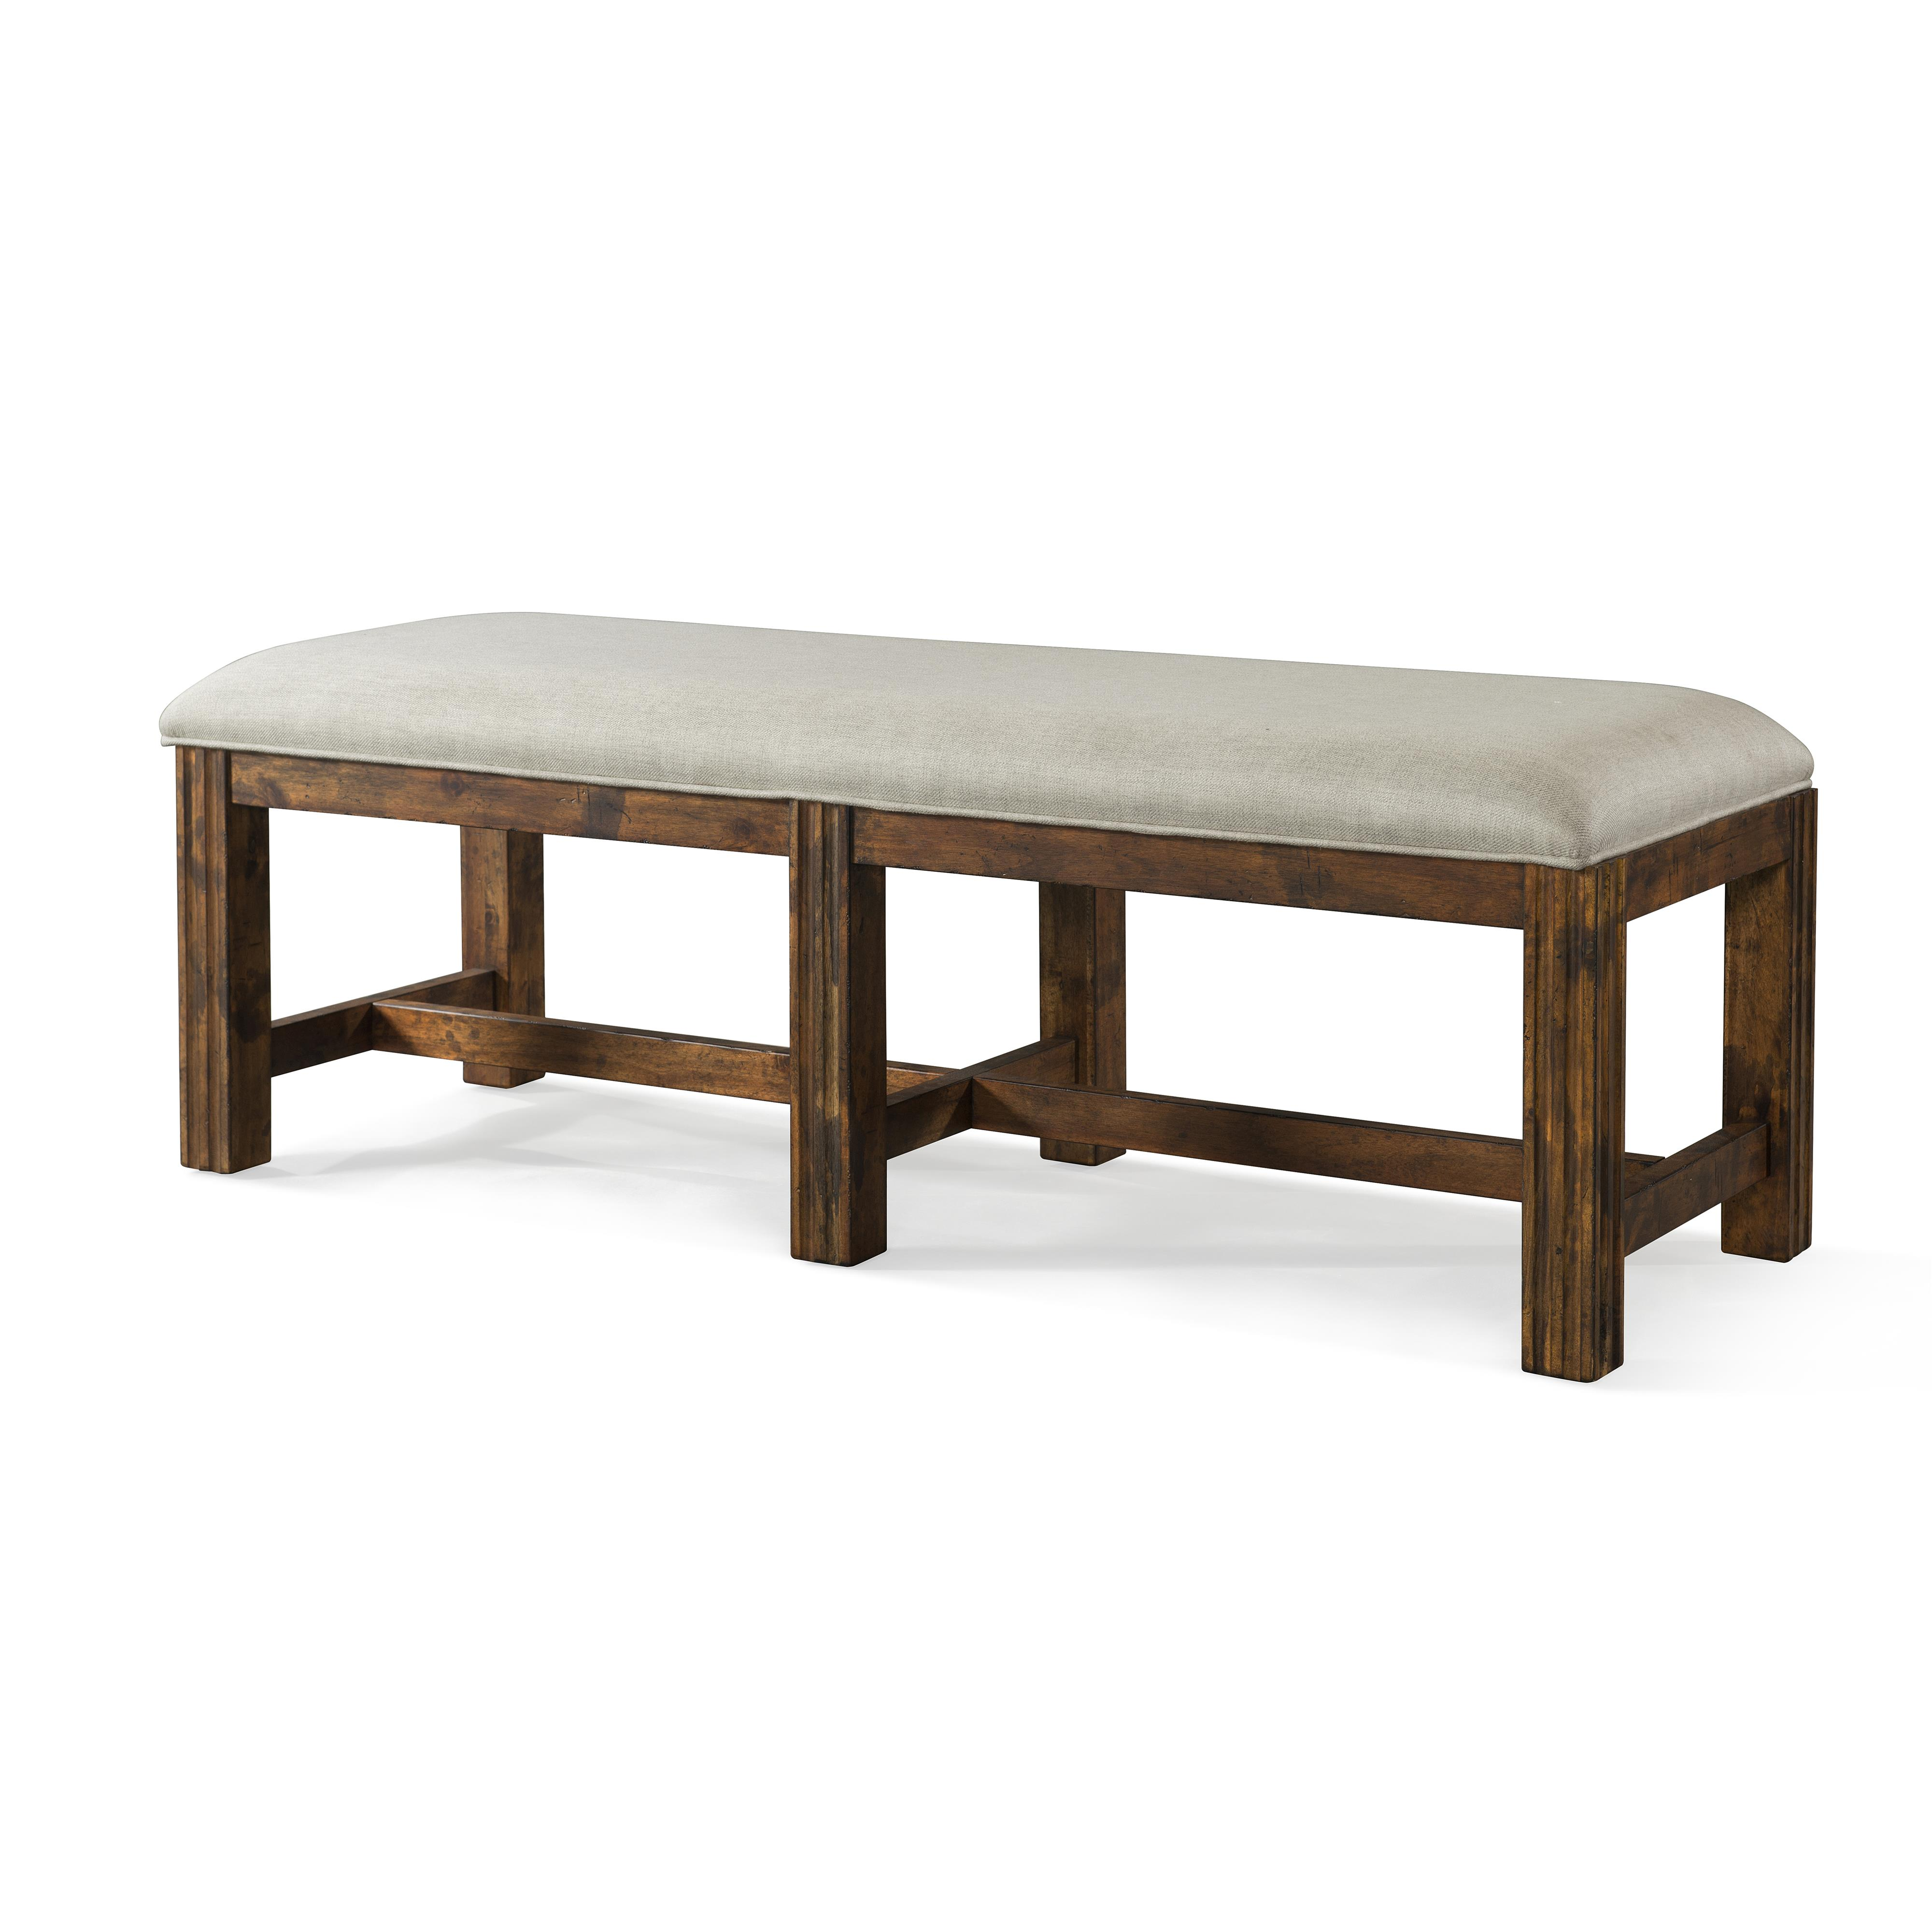 Trisha Yearwood Home Carroll Bench With Upholstered Seat By Trisha Yearwood Home Collection By Klaussner At Royal Furniture